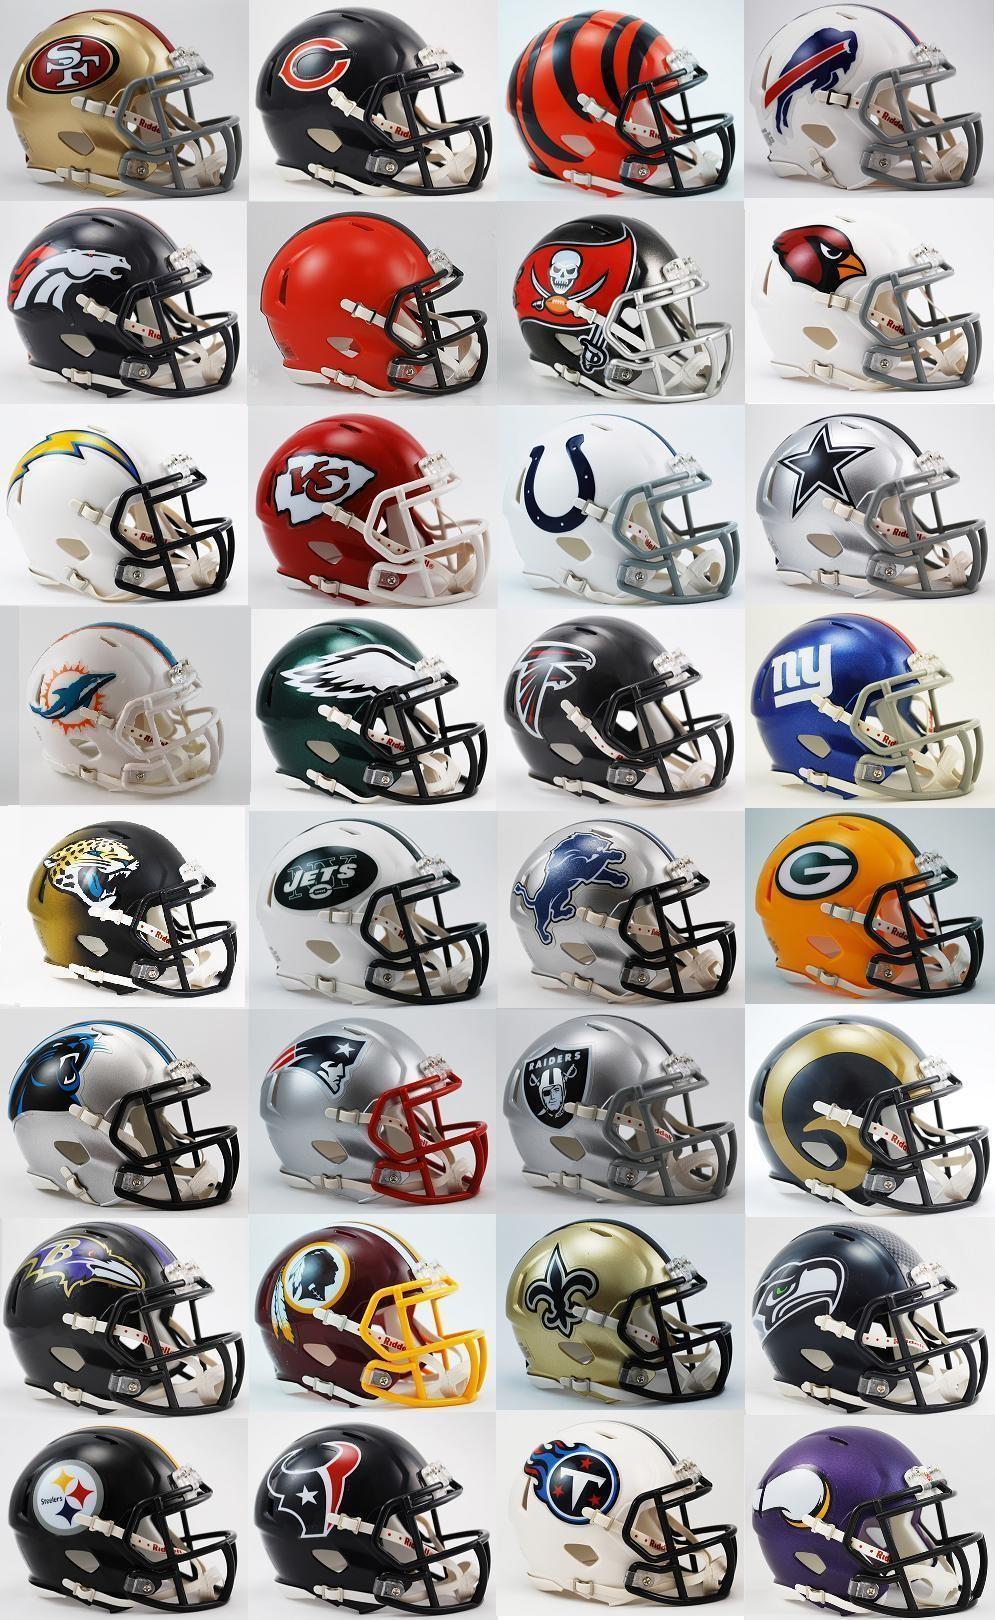 nfl helmets football mini 32 speed teams current riddell complete revolution helmet replica total